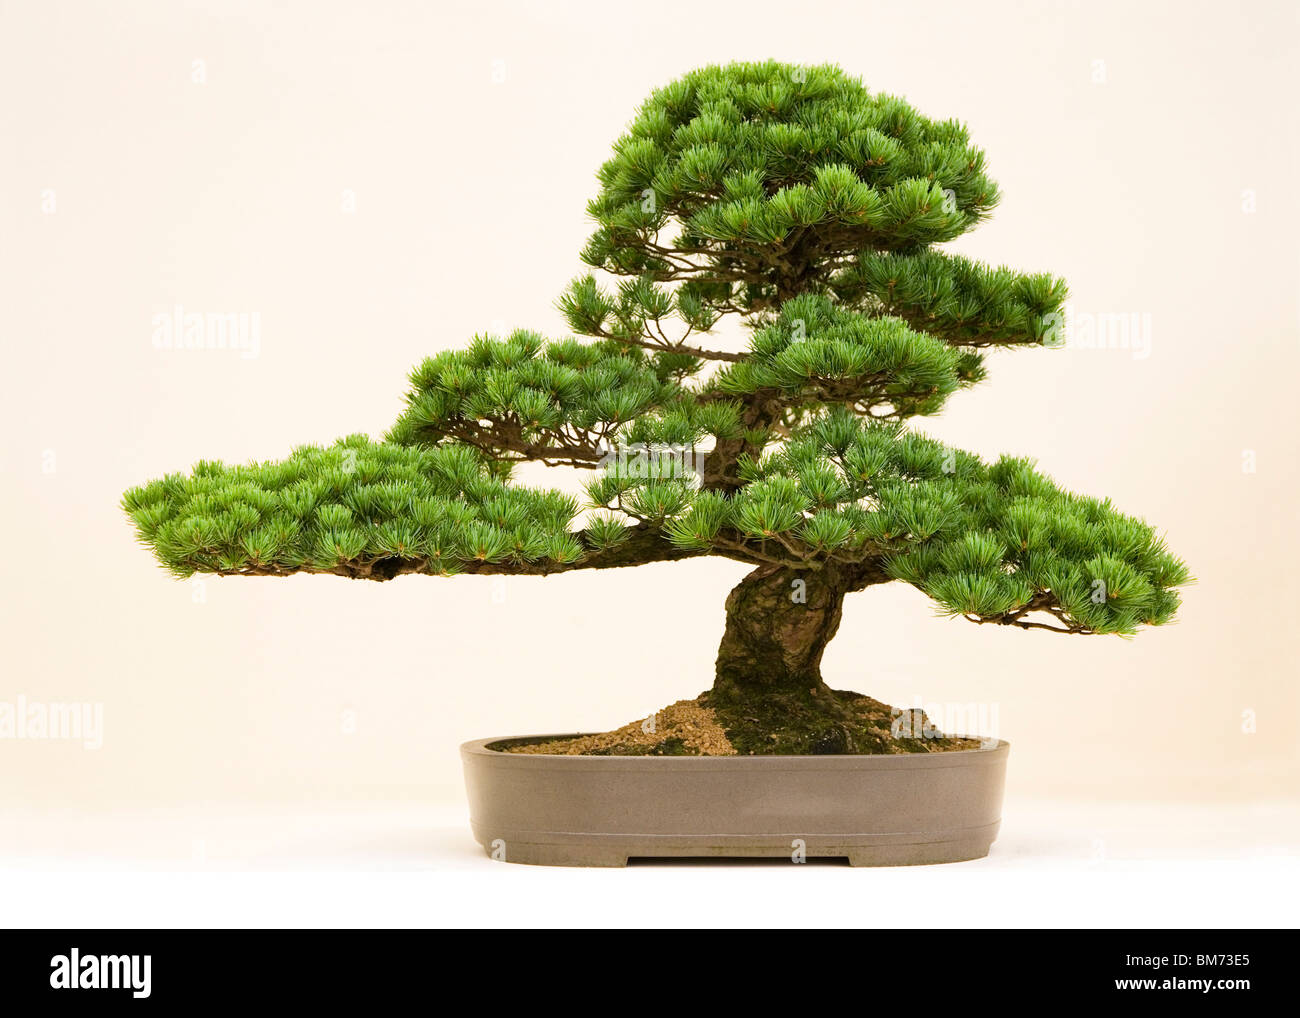 tree pruned stockfotos tree pruned bilder alamy. Black Bedroom Furniture Sets. Home Design Ideas